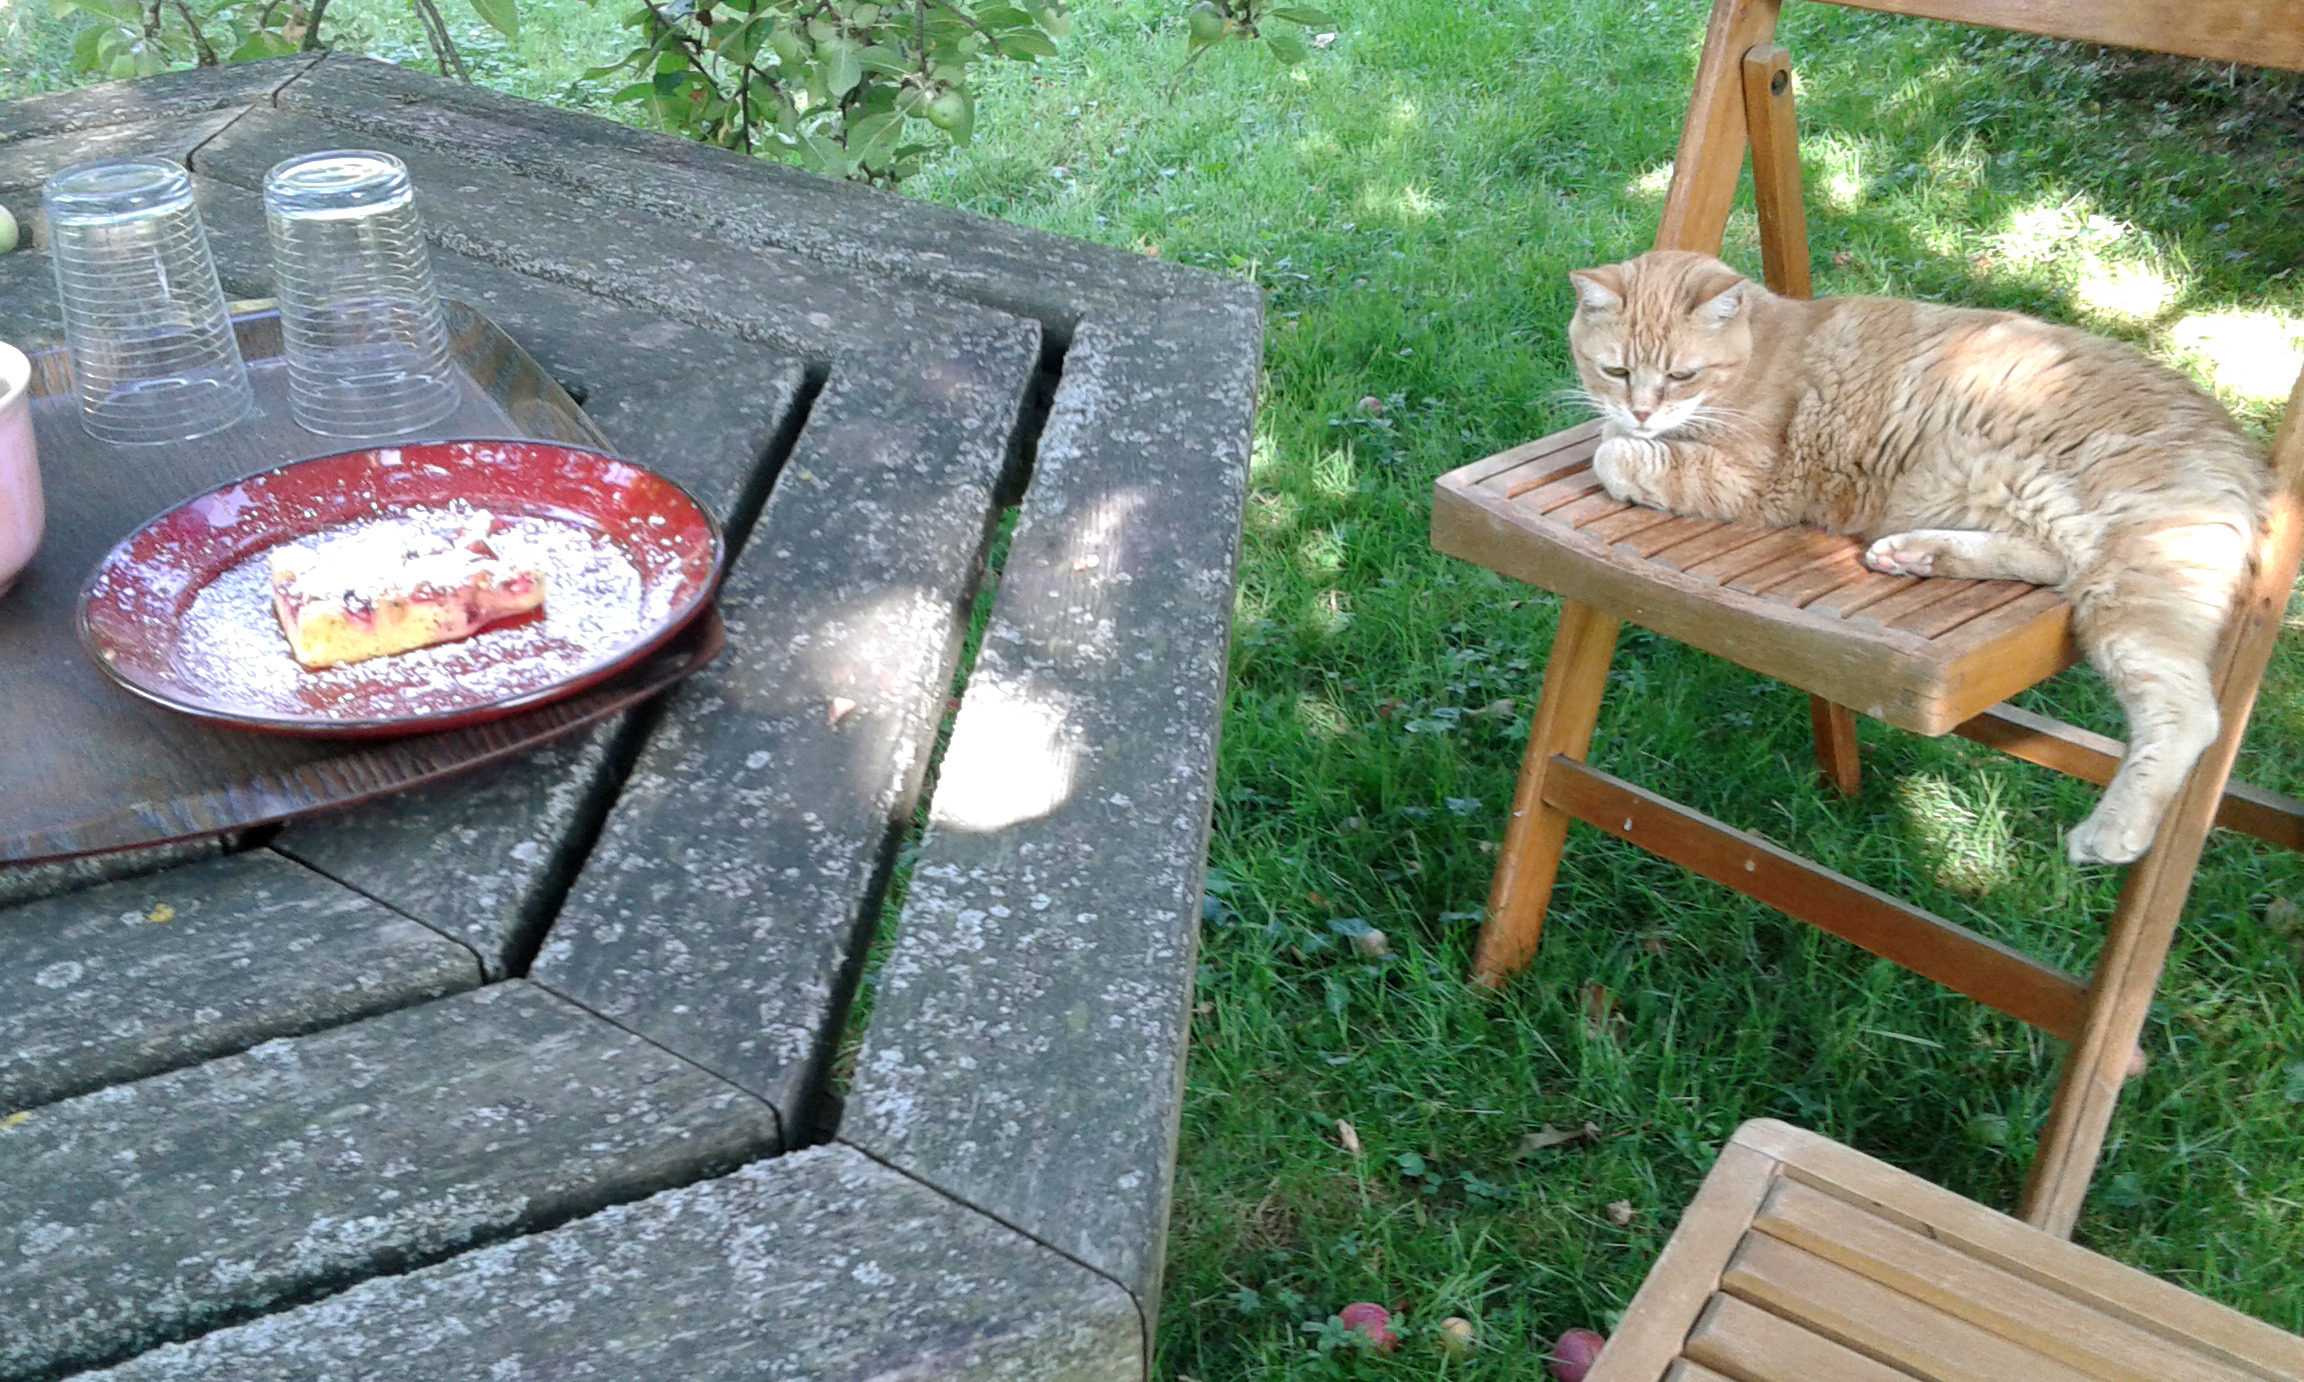 Schülerin meines Gartens | story.one